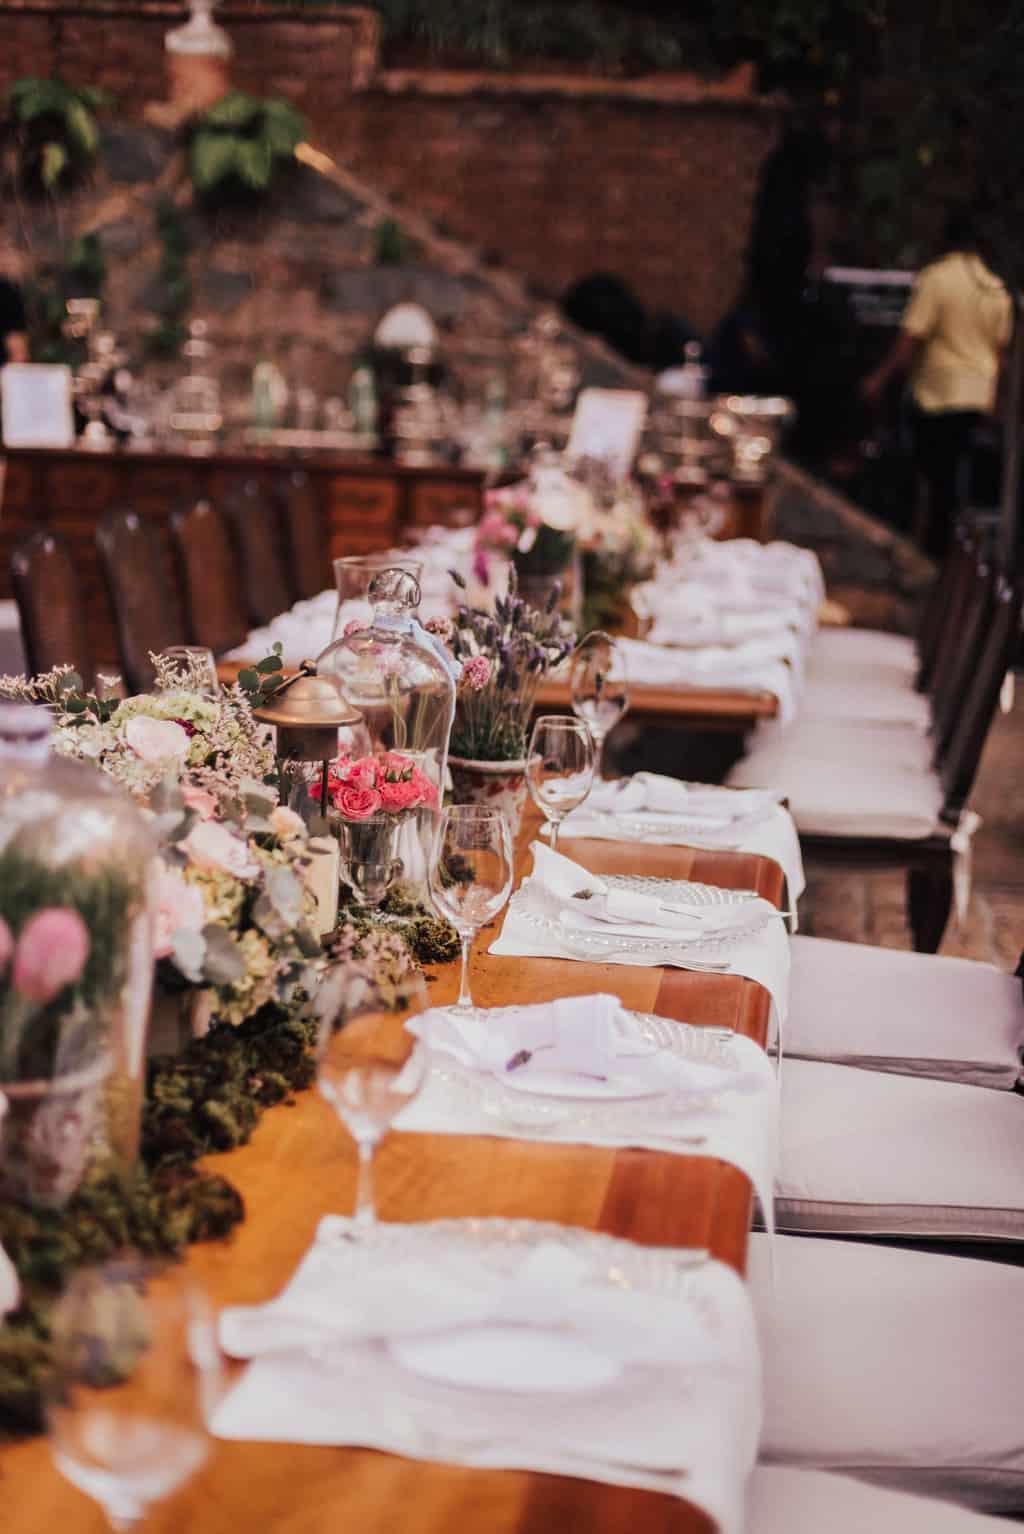 Boutique-de-Cena-casamento-Rebeca-e-Eldrey-Fazenda-Vila-Rica-Fotografia-Mana-Gollo-mesa-dos-convidados-Toda-de-Branco39